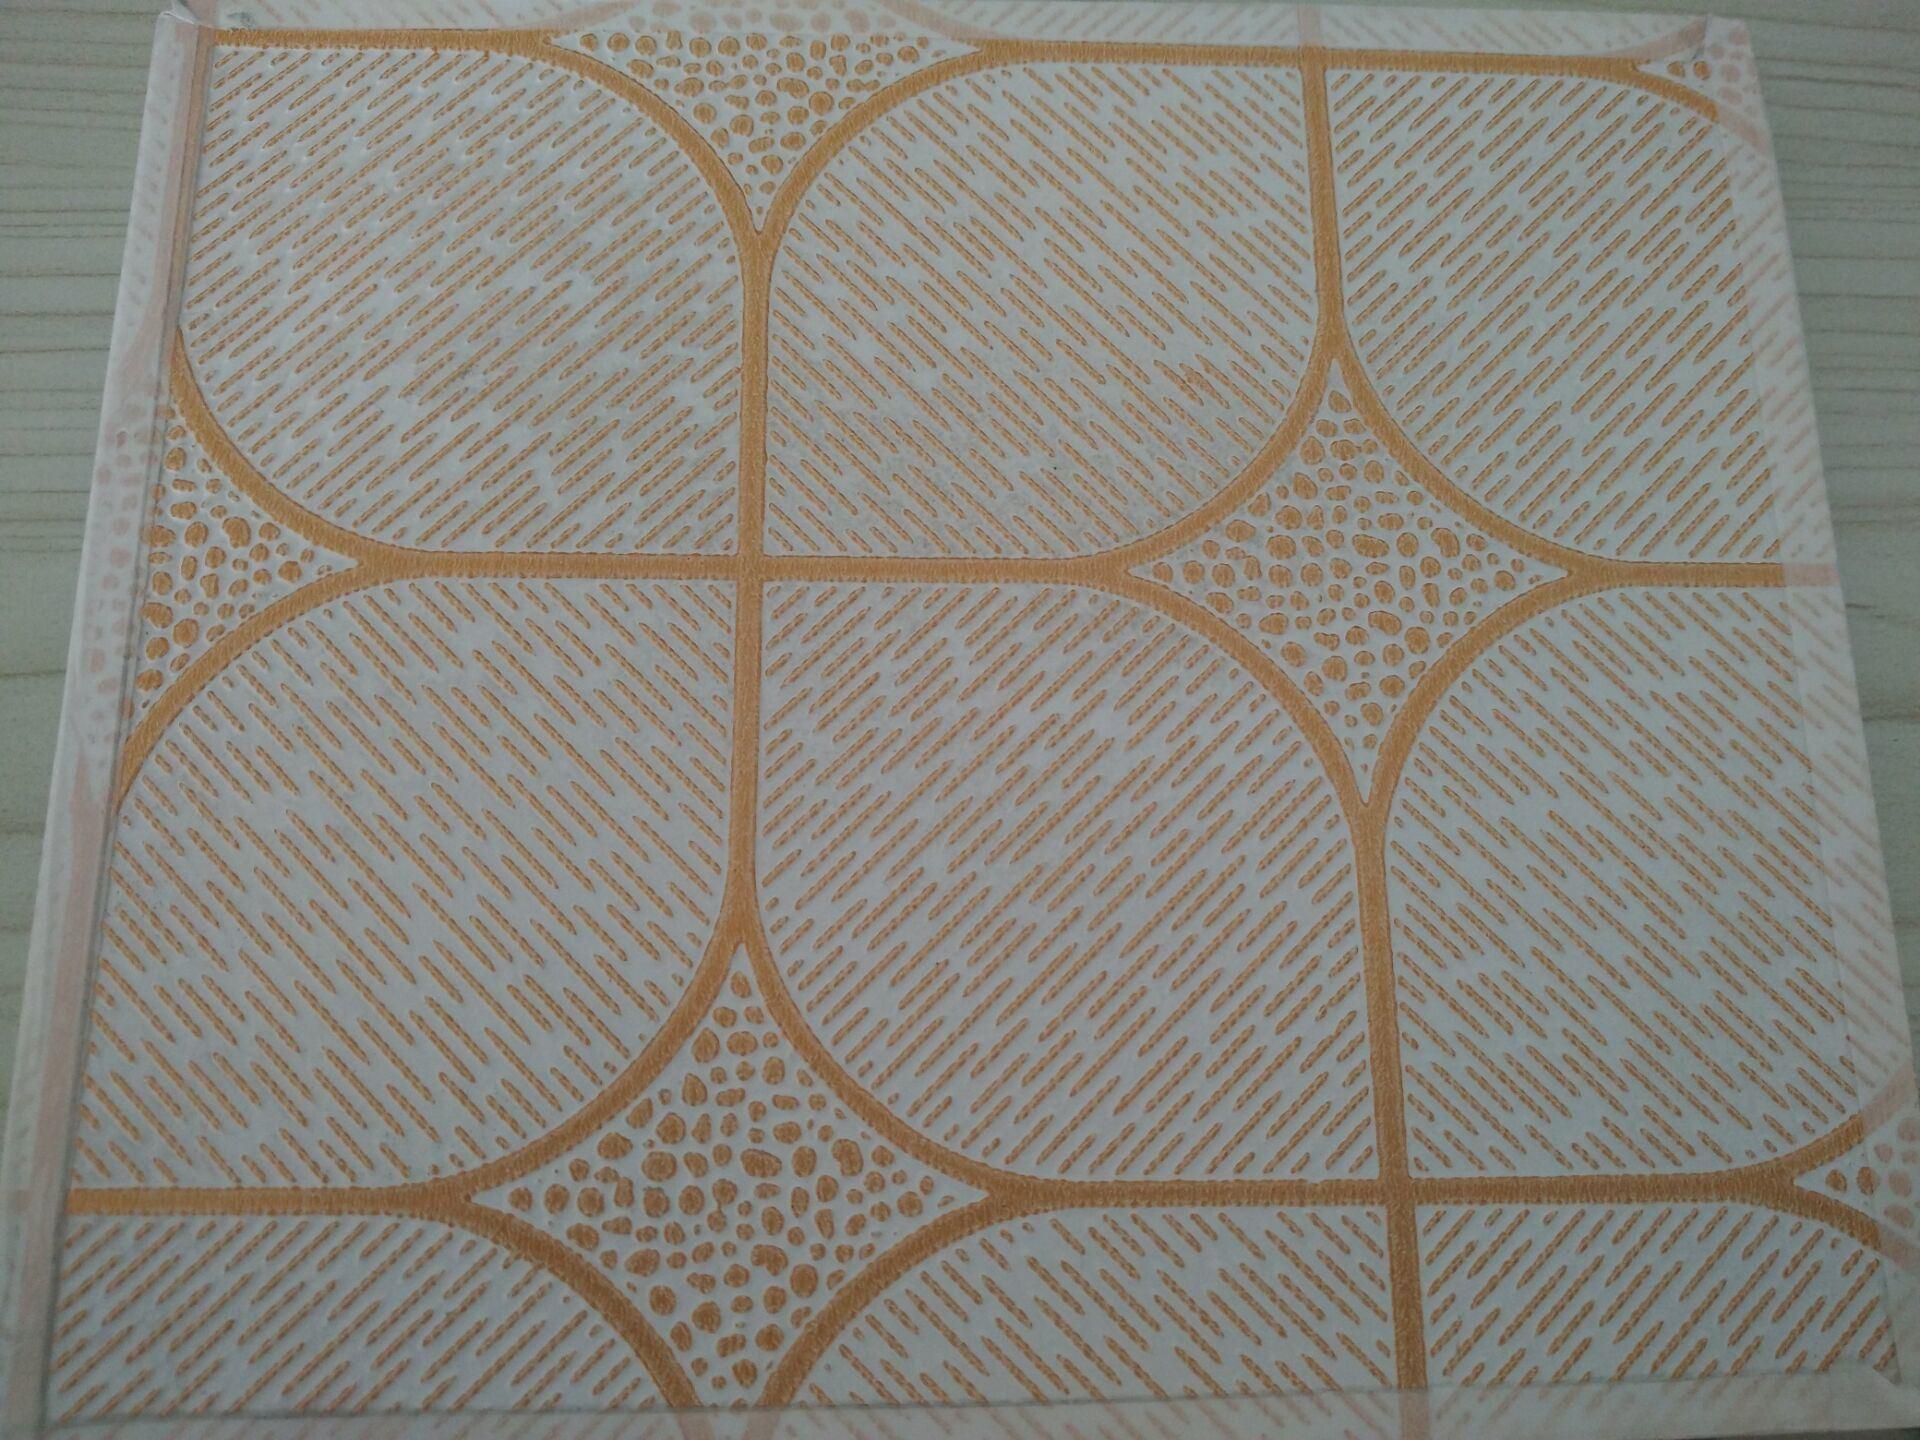 Gypsum board ceiling tiles best ceiling 2018 pvc gypsum board ceiling decoration mercial kitchen dailygadgetfo Gallery